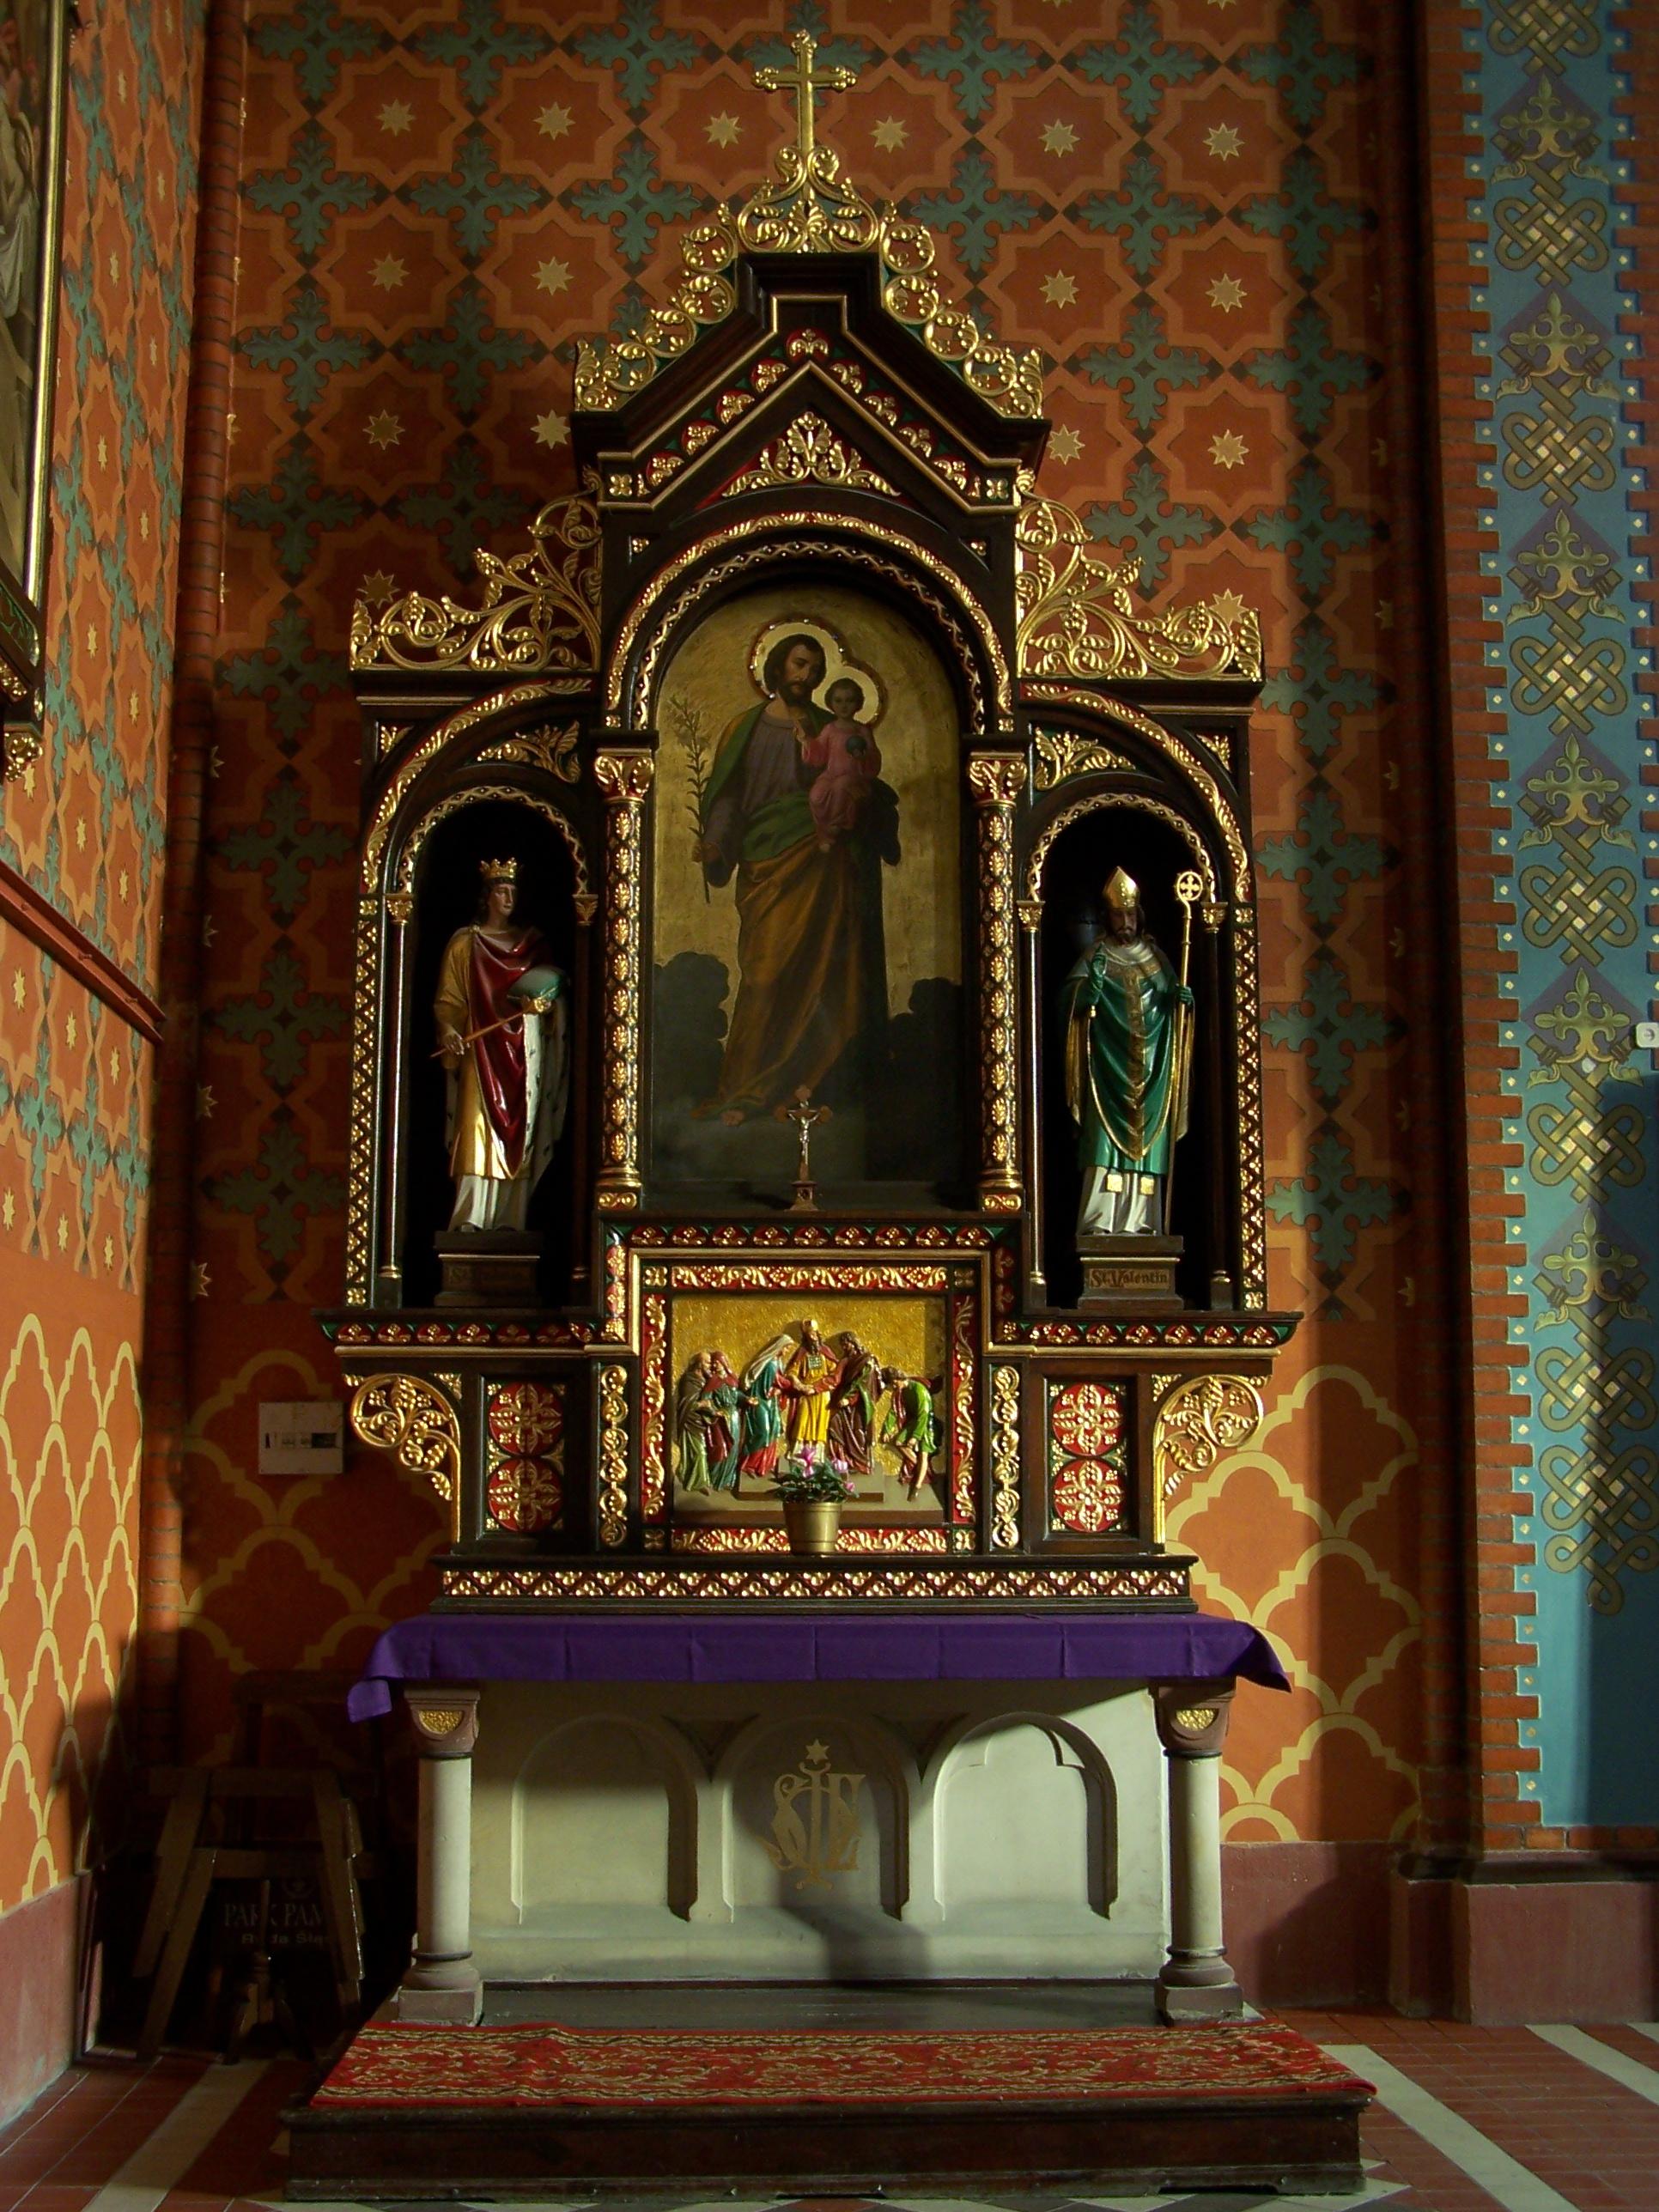 https://upload.wikimedia.org/wikipedia/commons/8/84/Koch%C5%82owice_-_Holy_Trinity_Church_-_Altar_02.JPG